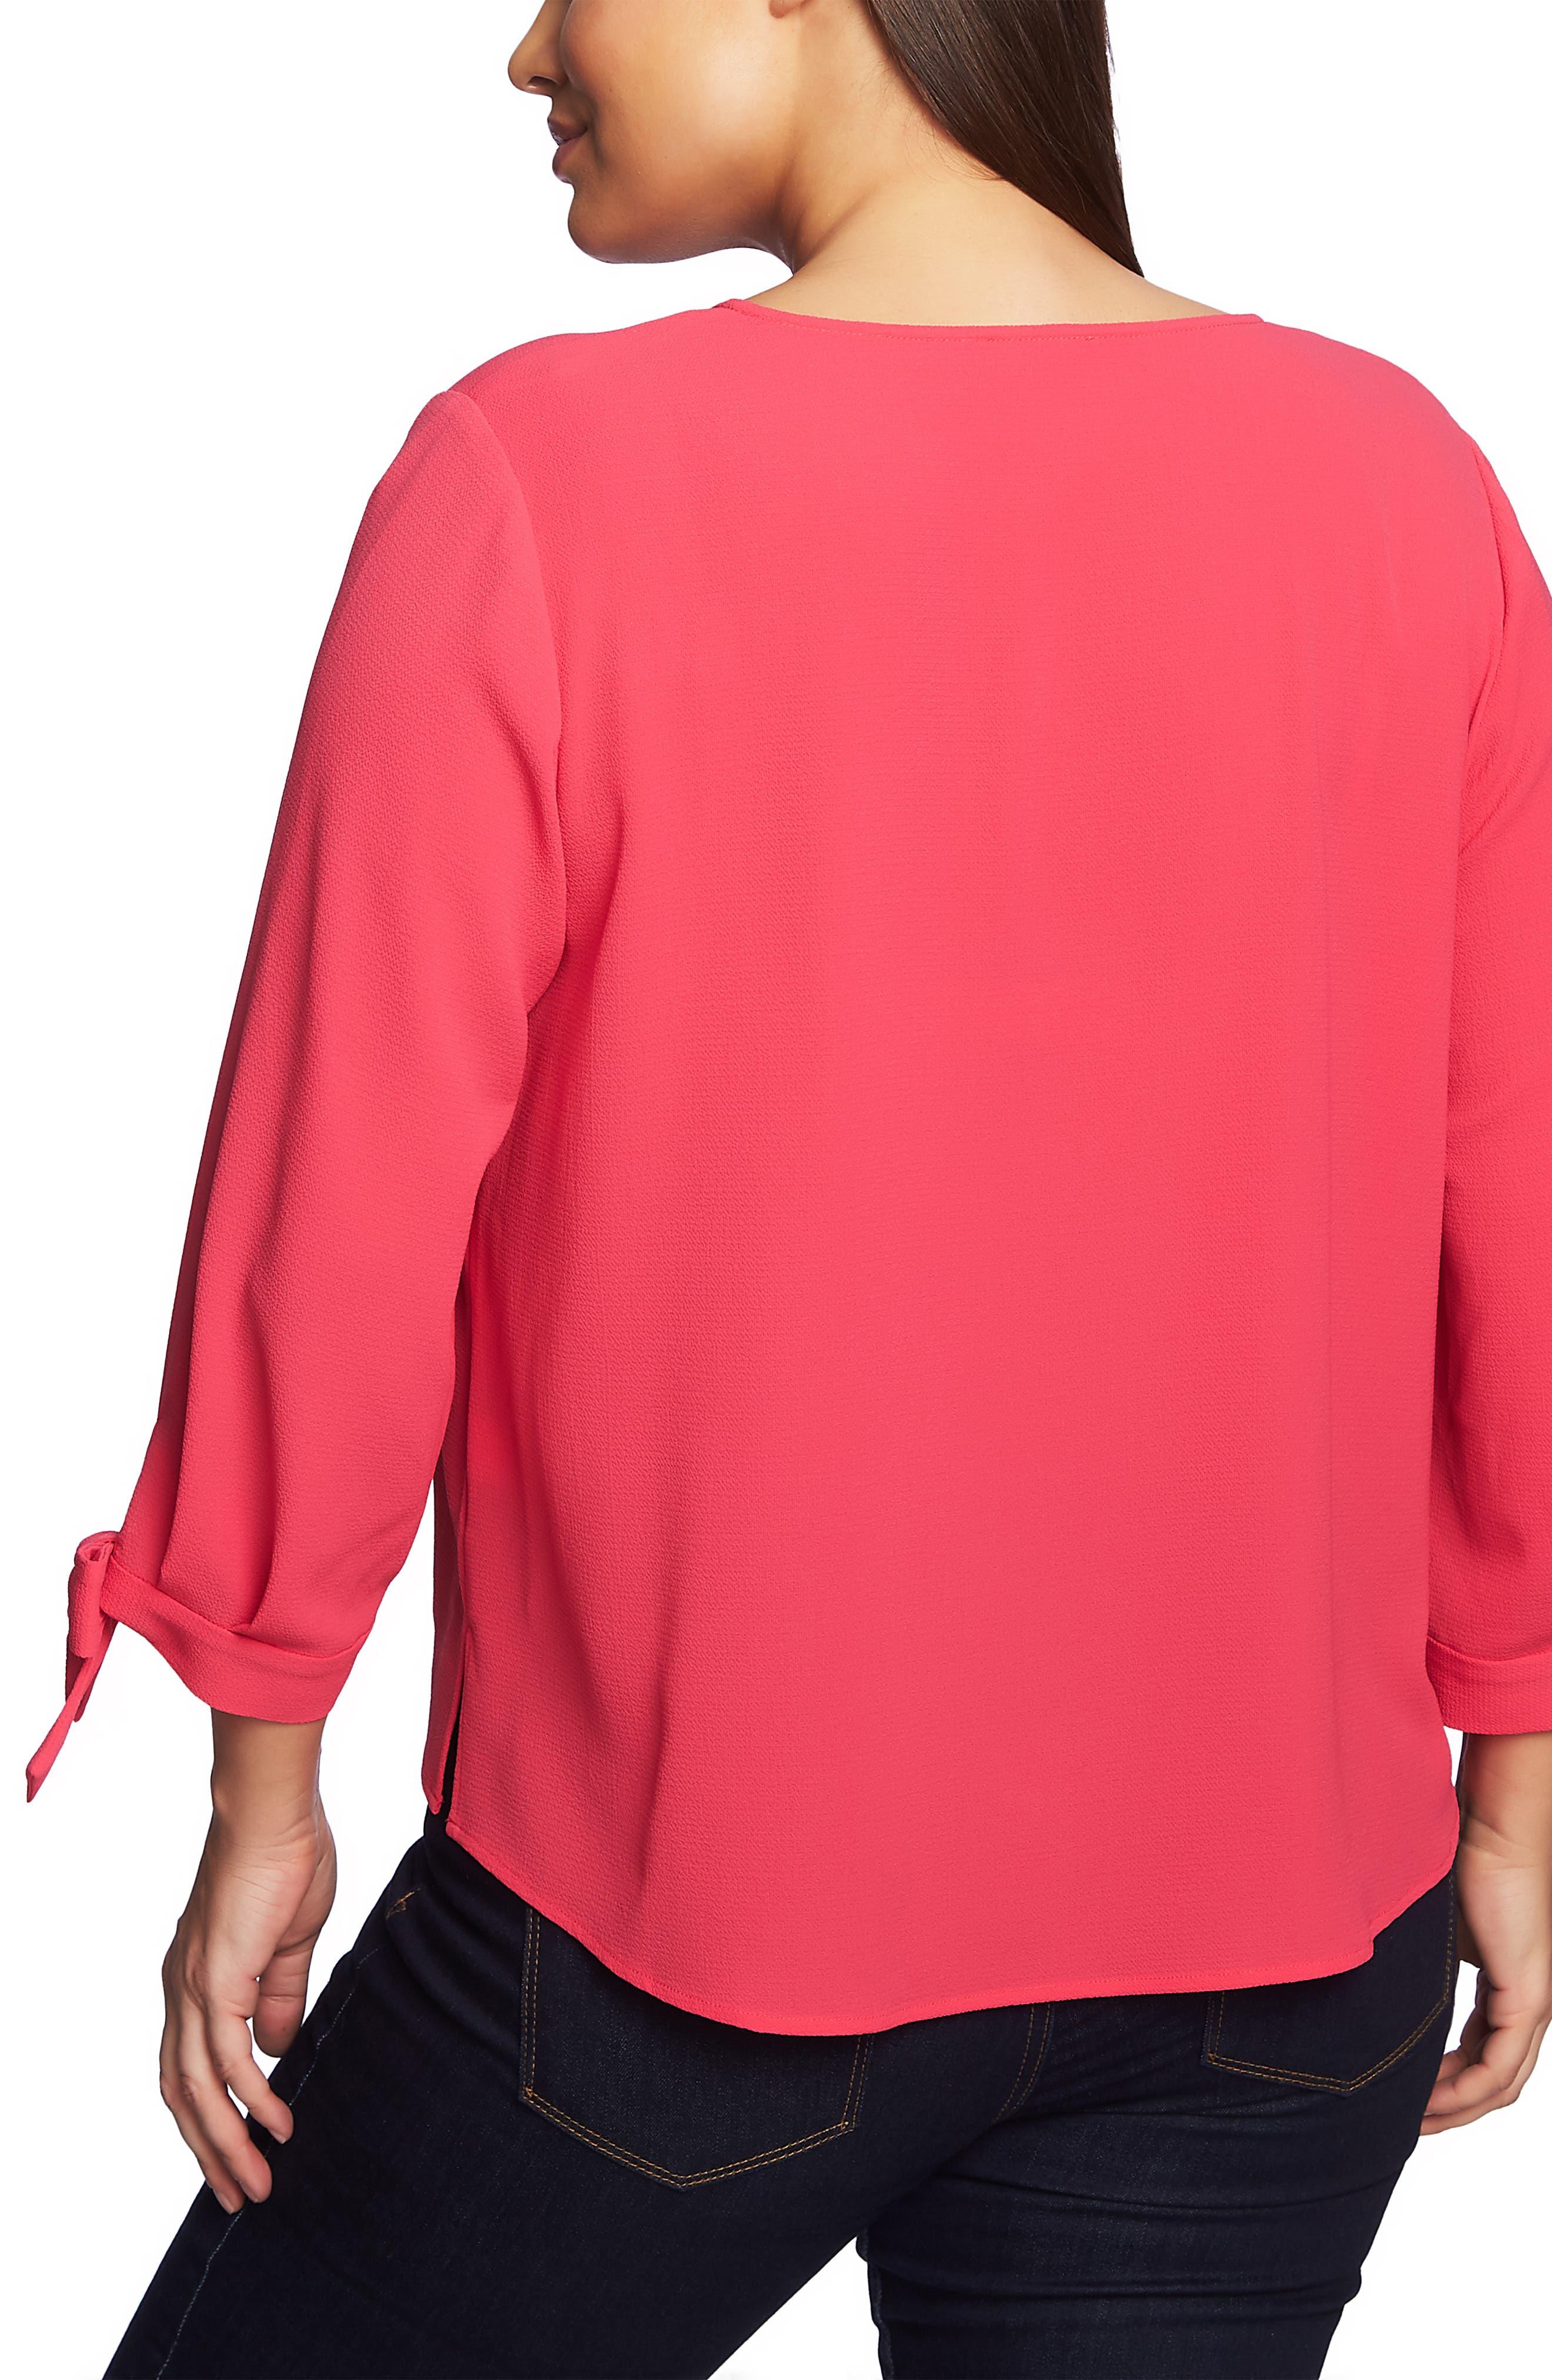 CECE,                             Tie Sleeve Blouse,                             Alternate thumbnail 2, color,                             FUCHSIA PETAL